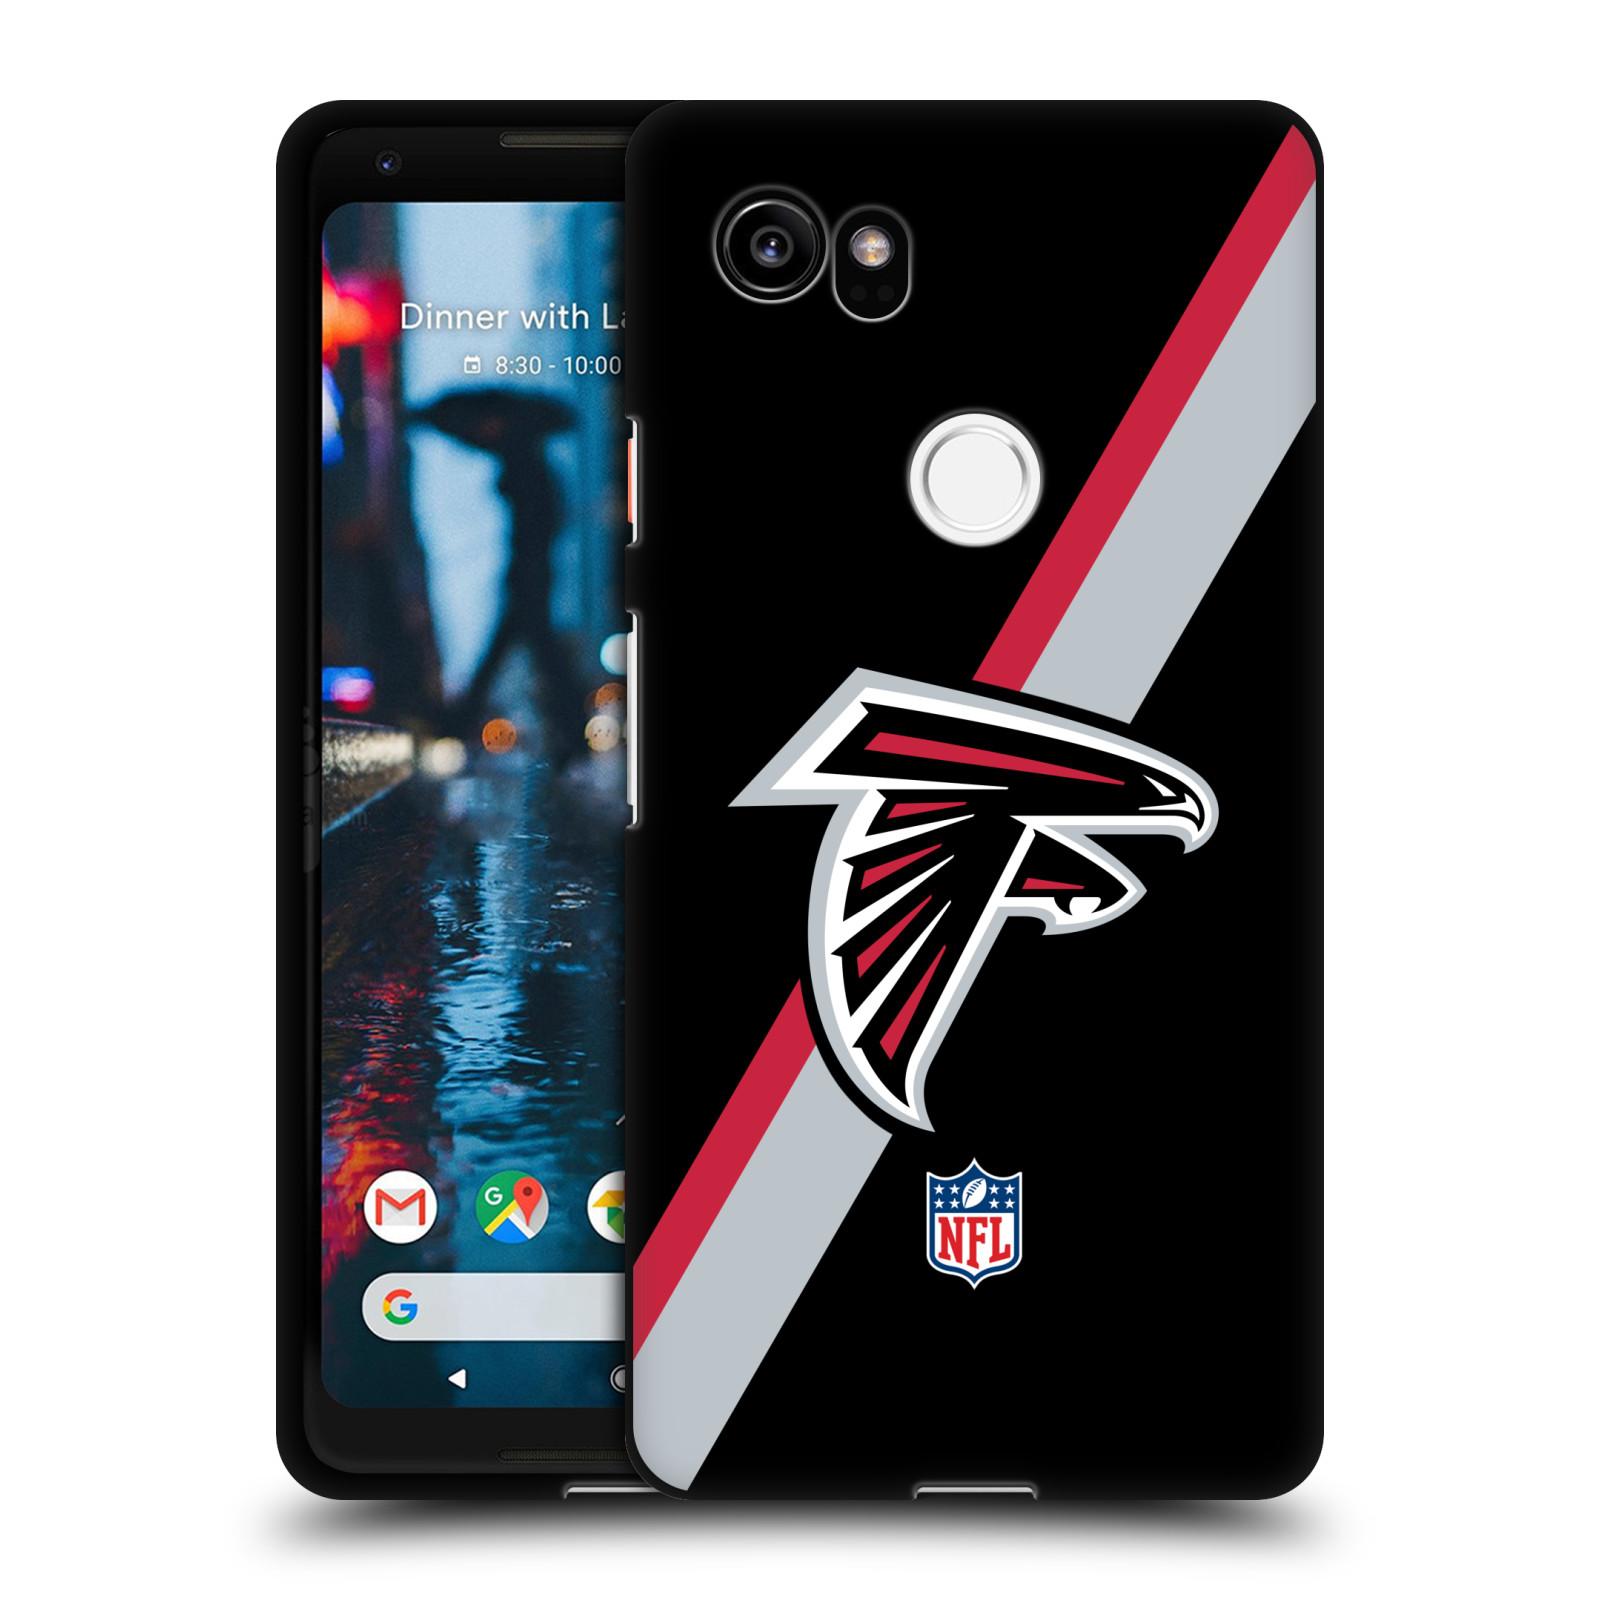 OFFICIAL-NFL-ATLANTA-FALCONS-LOGO-BLACK-SOFT-GEL-CASE-FOR-GOOGLE-PHONES